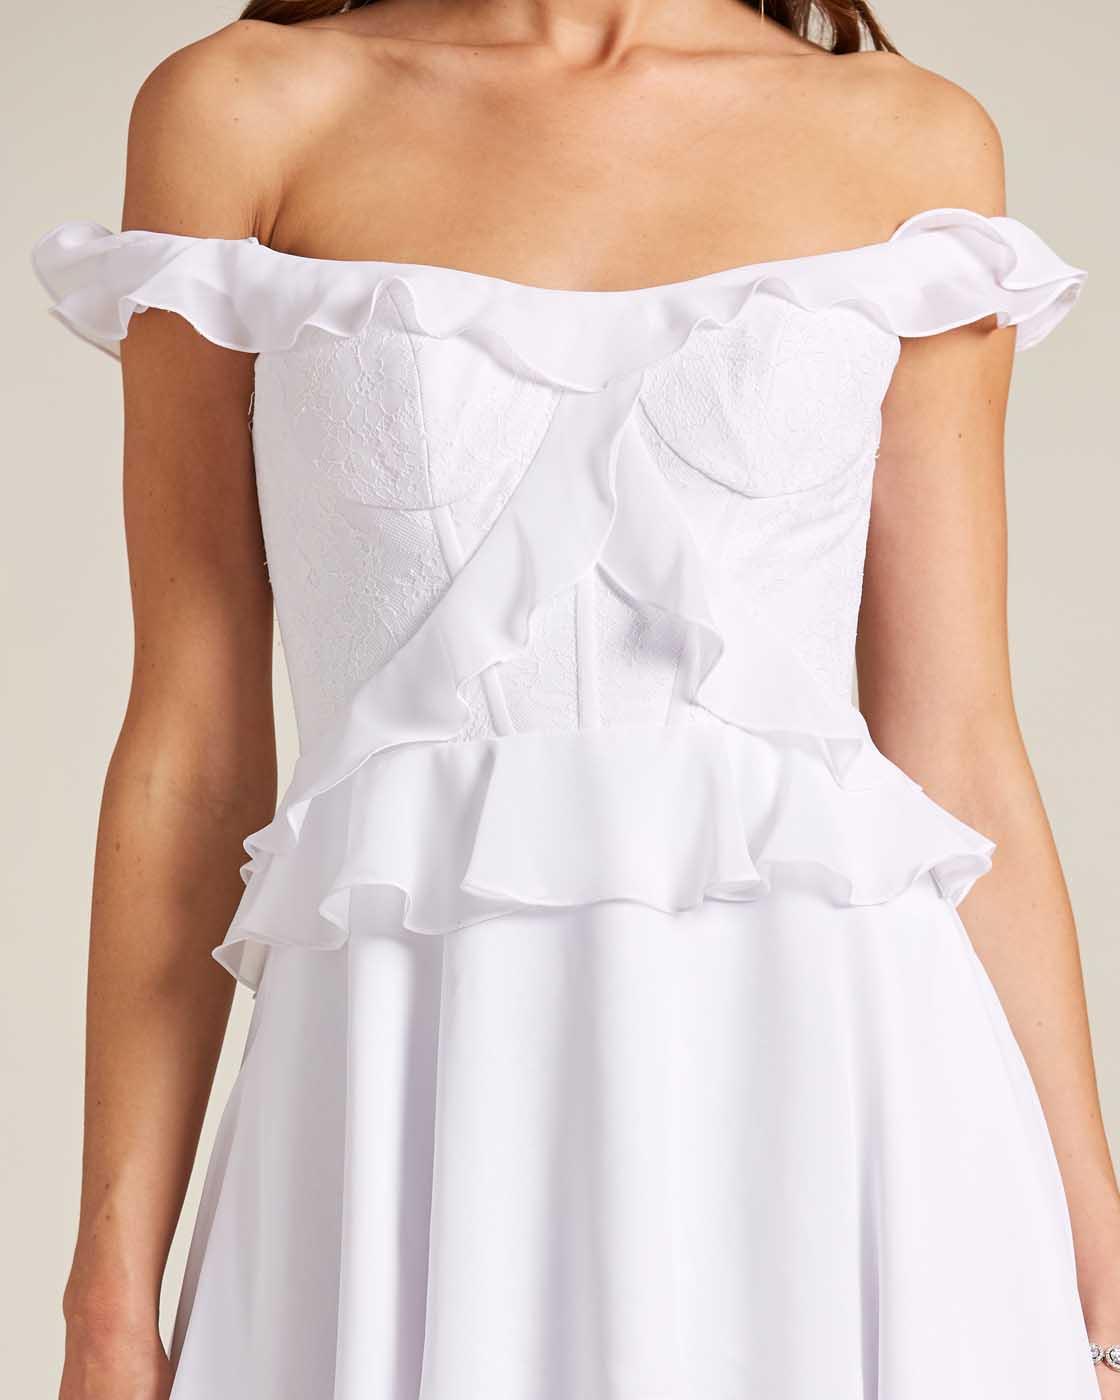 Classic Open Back Ruffle Style Wedding Dress - Detail